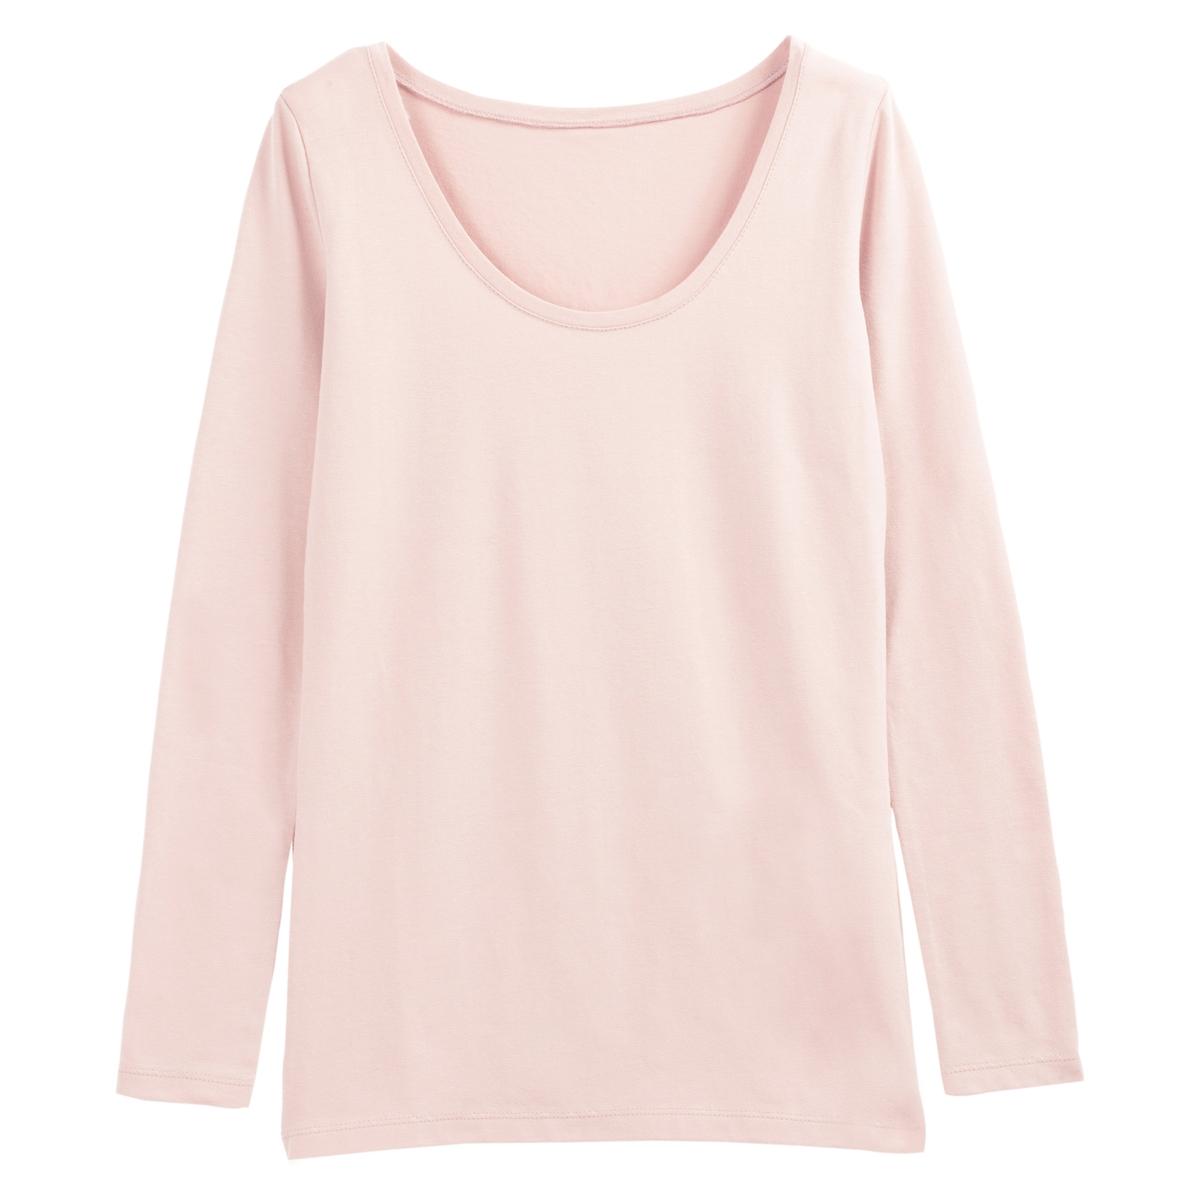 Camiseta amplia con cuello redondo, de manga larga